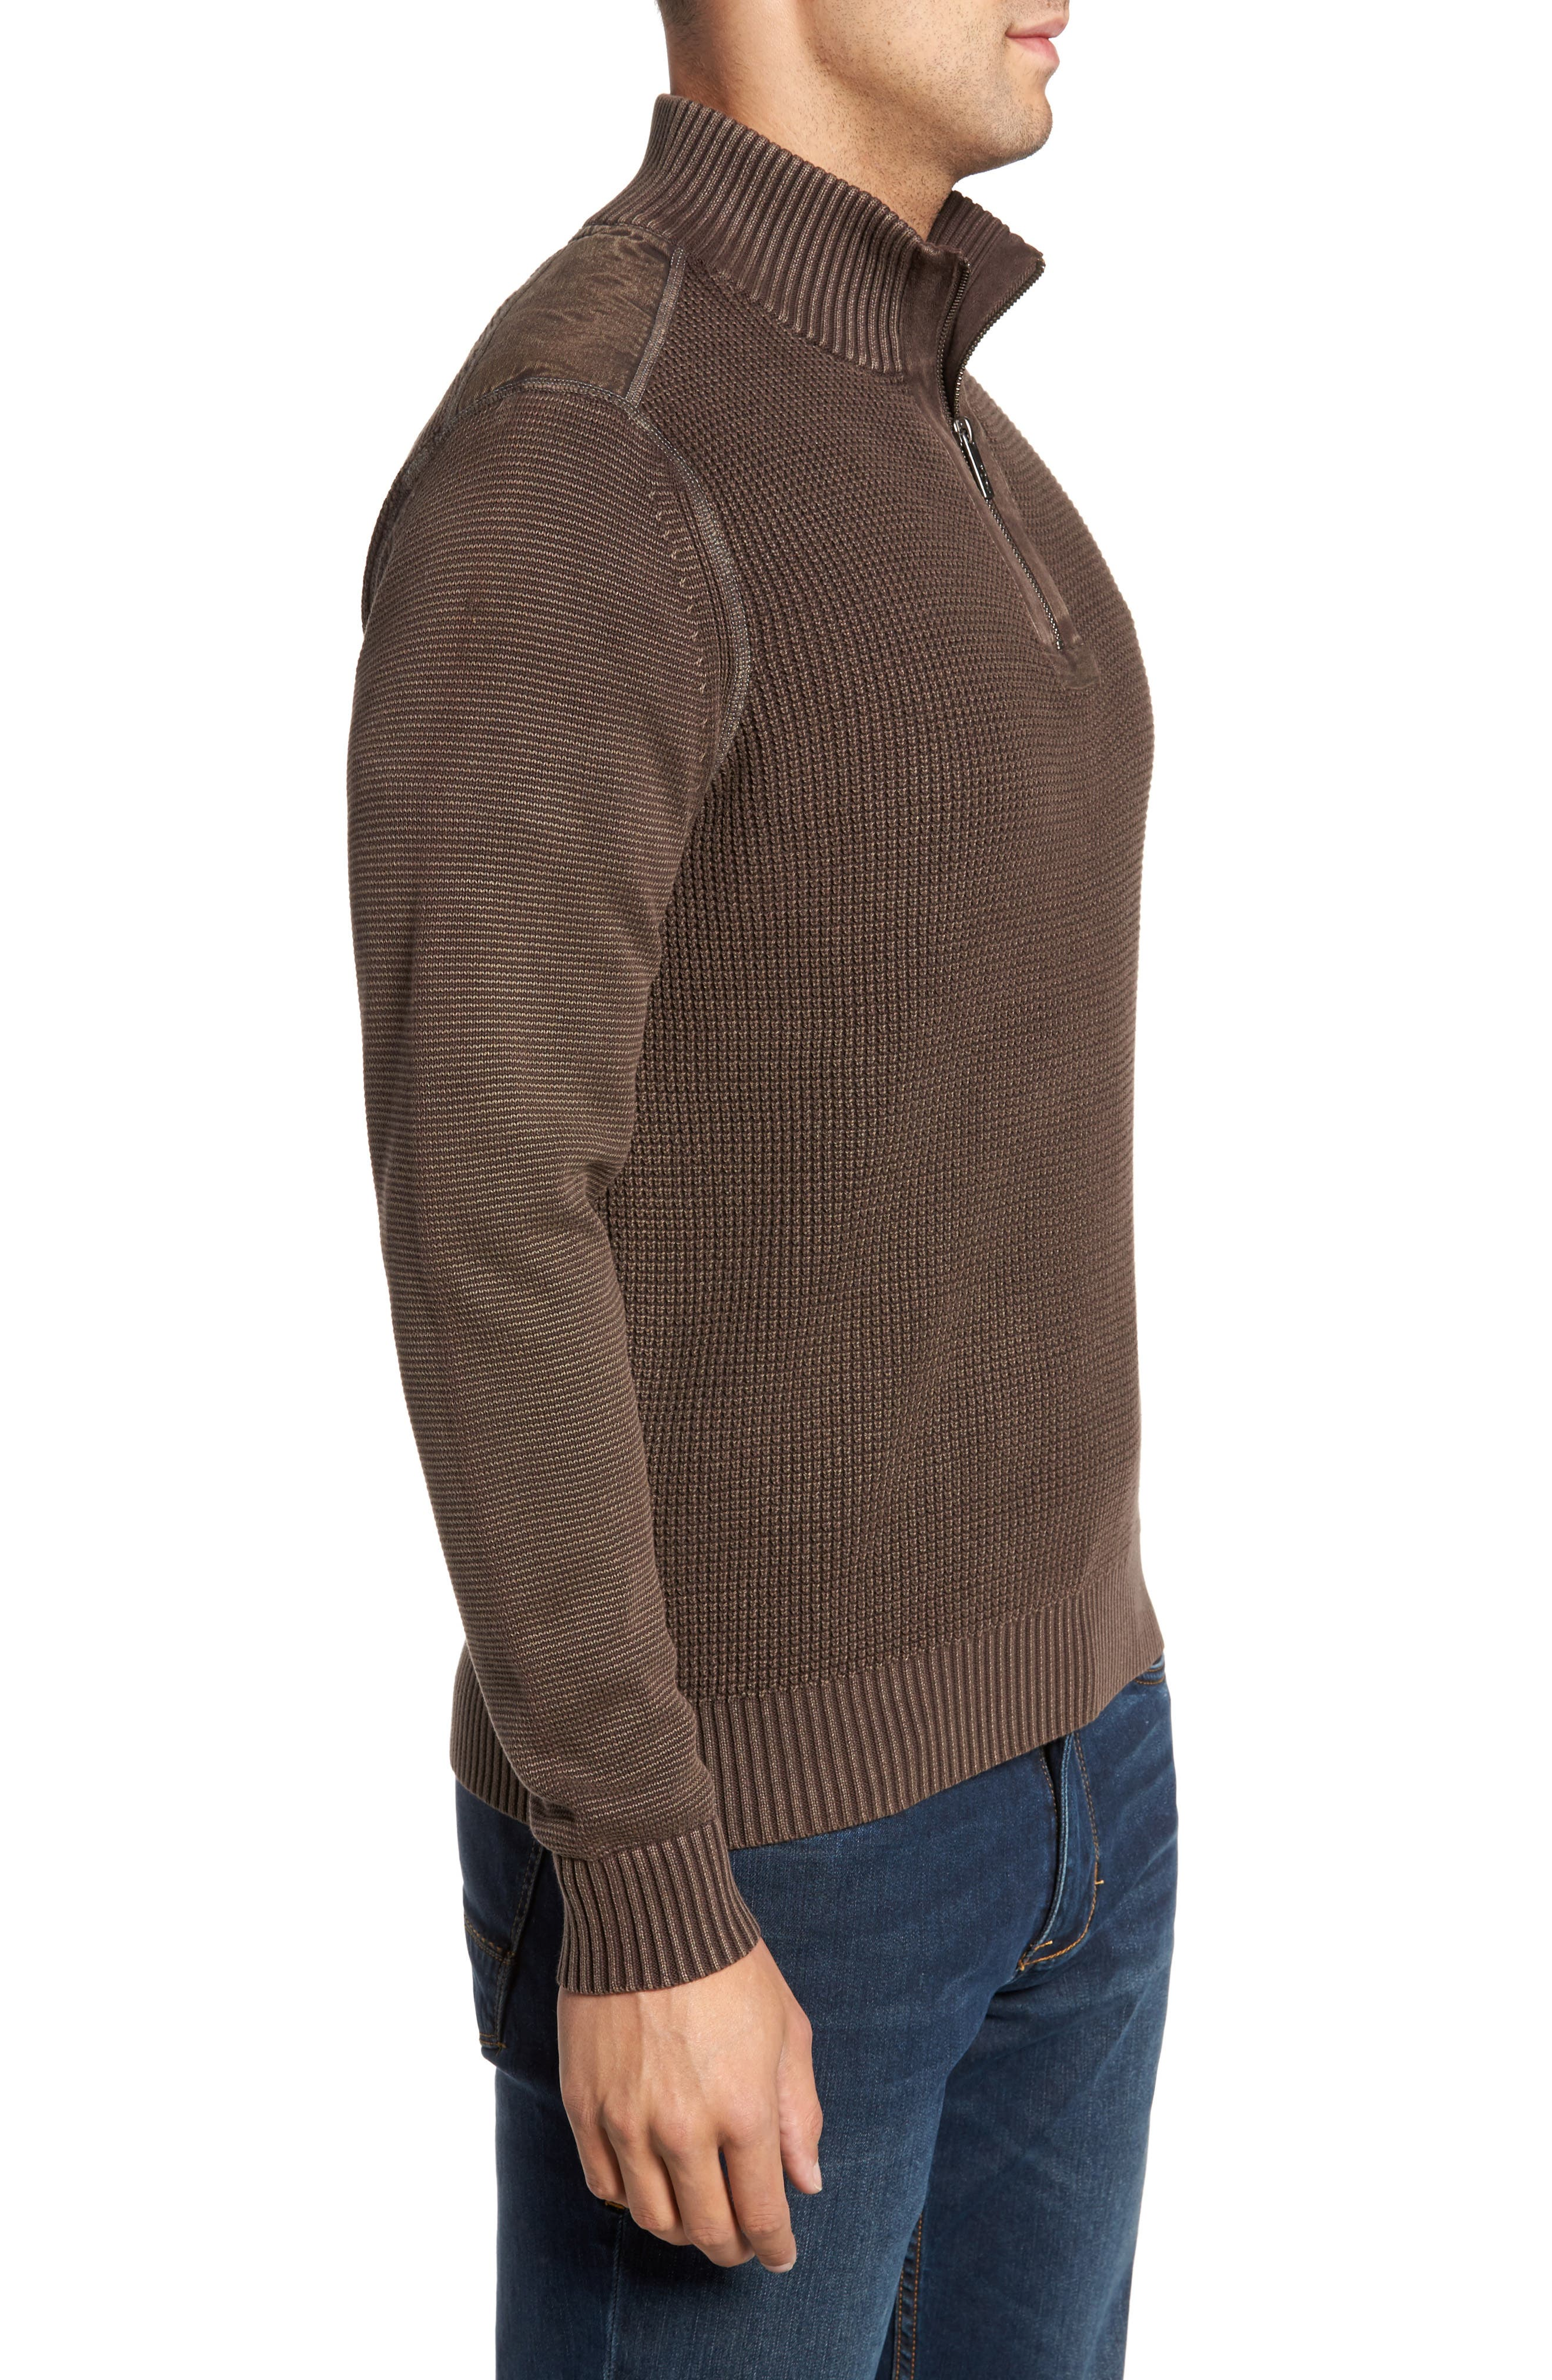 'Coastal Shores' Quarter Zip Sweater,                             Alternate thumbnail 3, color,                             Tilth